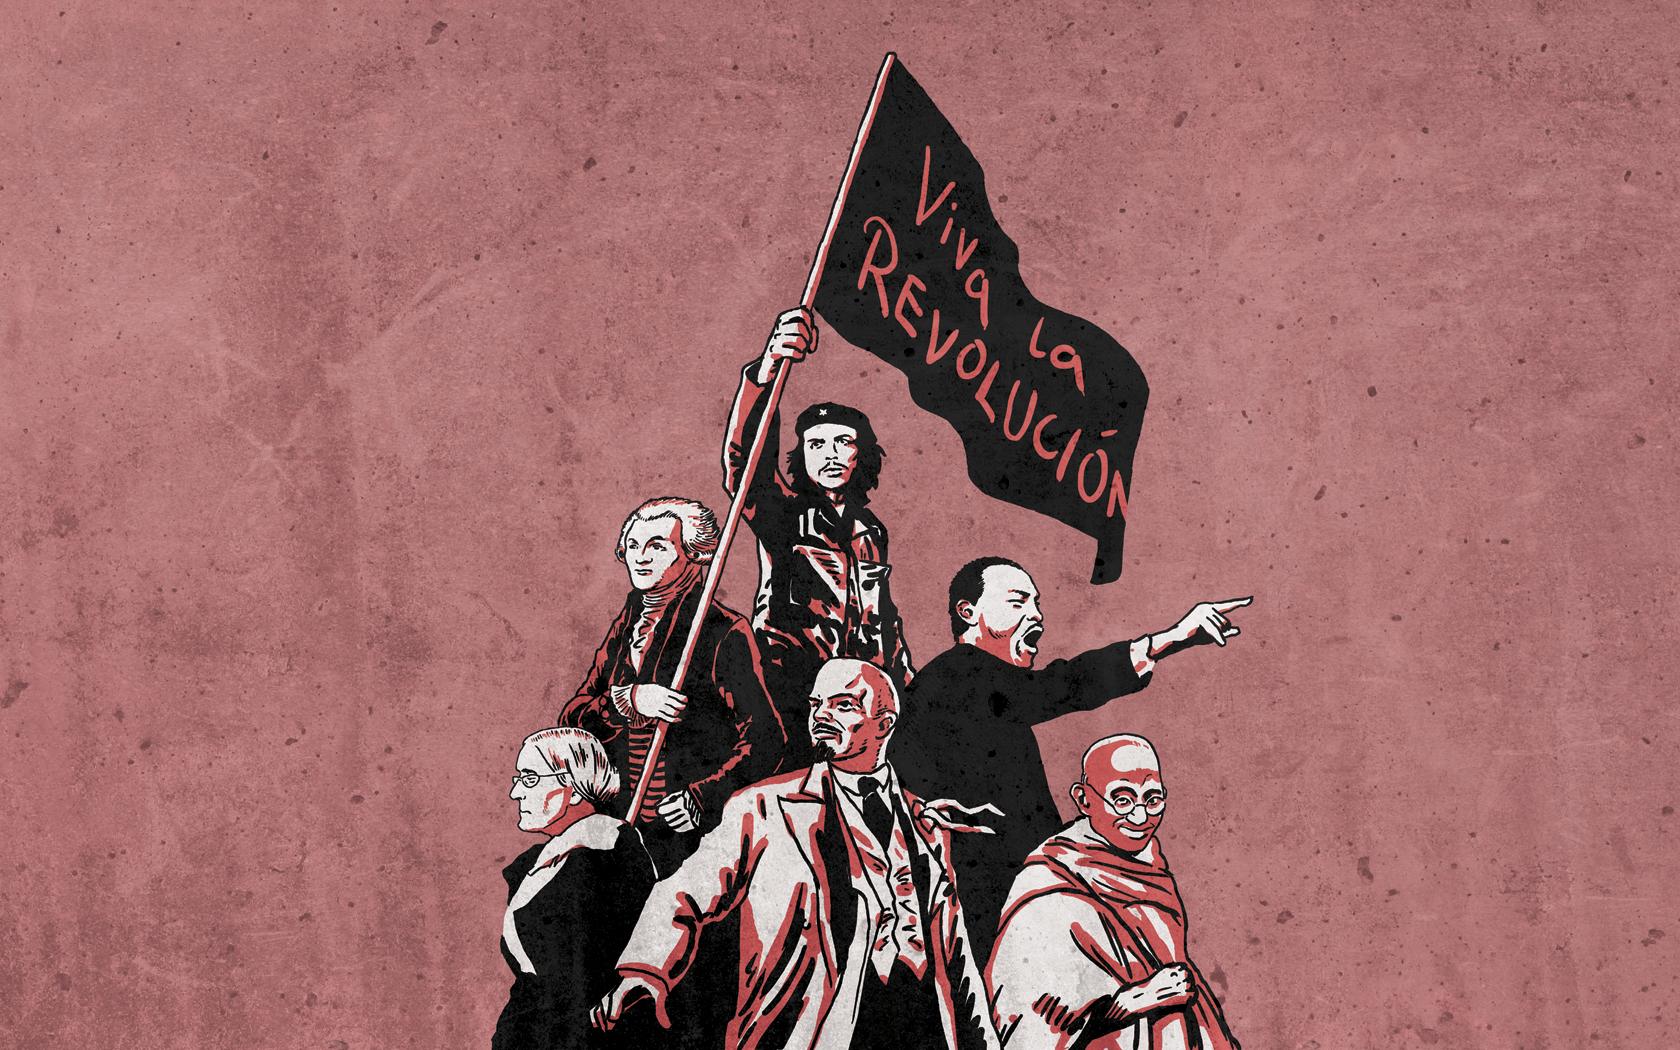 [Image: viva_la_revolucion_wallpaper_by_domigorgon-d4pu6h2.jpg]